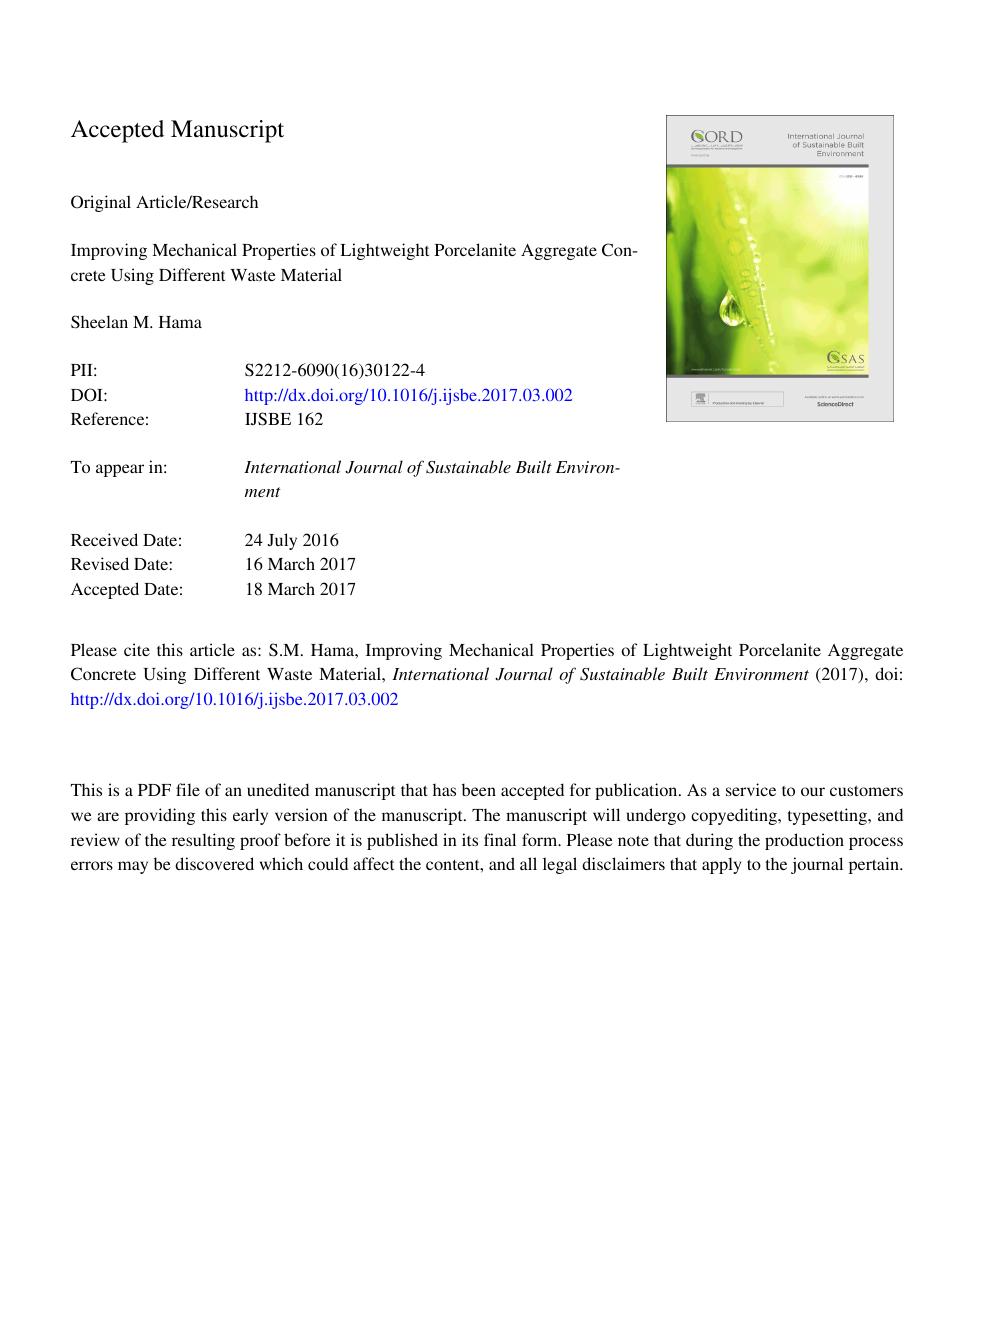 Improving mechanical properties of lightweight Porcelanite